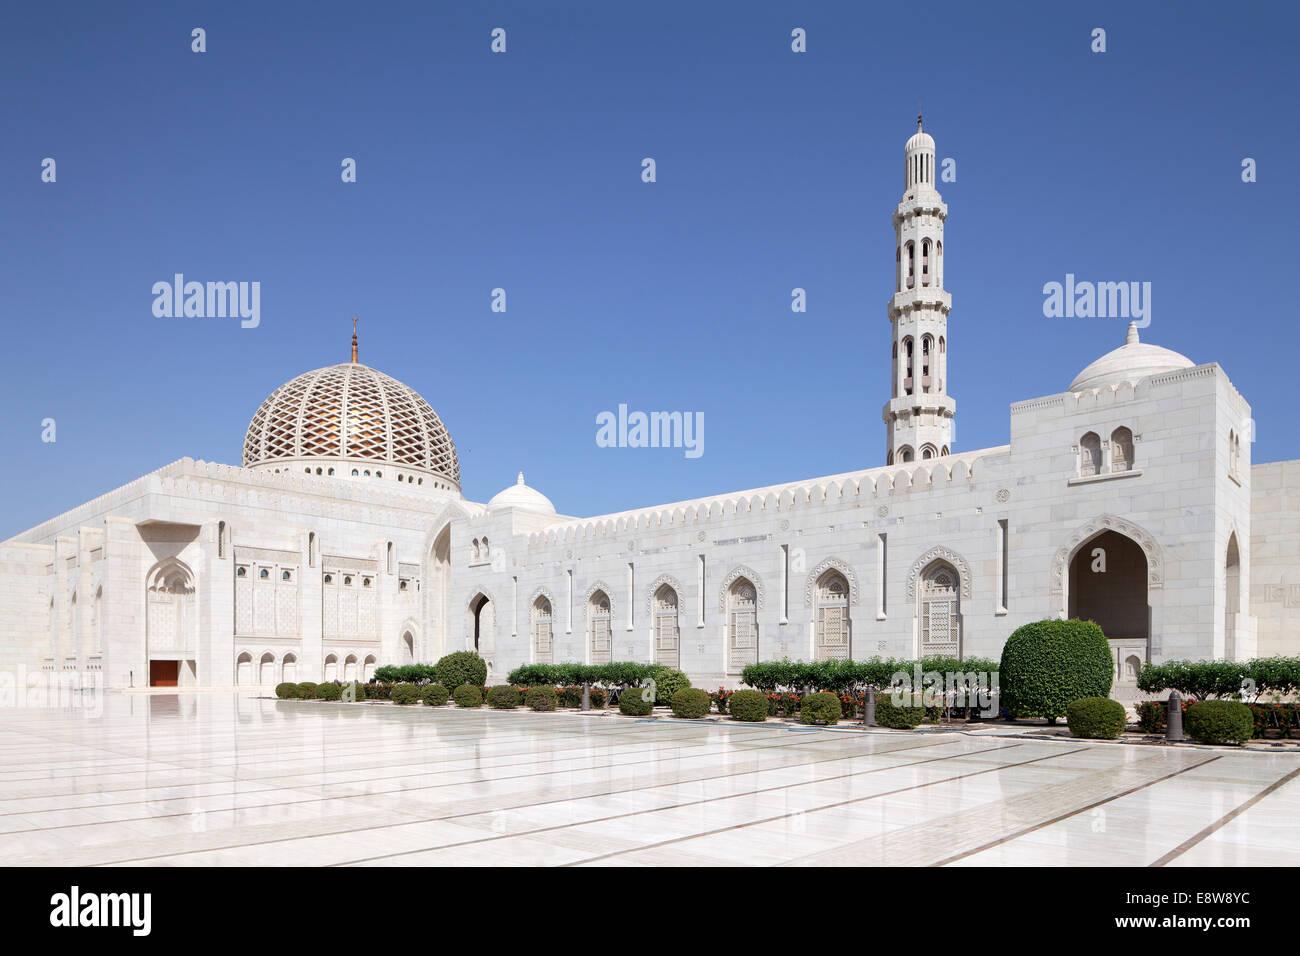 Grande Mosquée Sultan Qaboos, Muscat, Oman Photo Stock